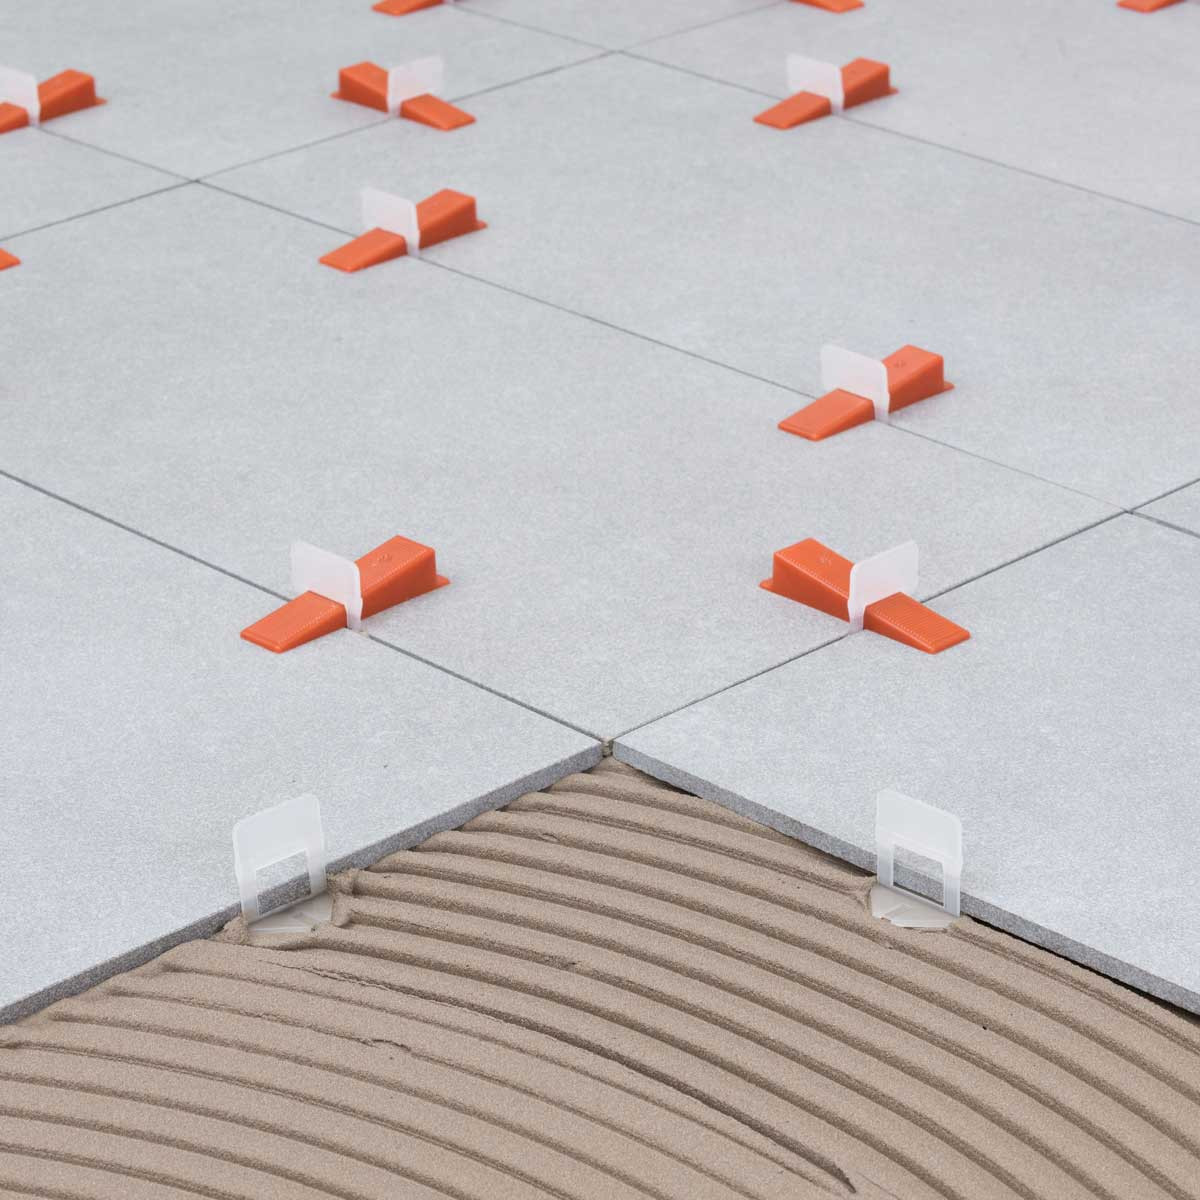 RLS leveling wedge and clip on porcelain tile